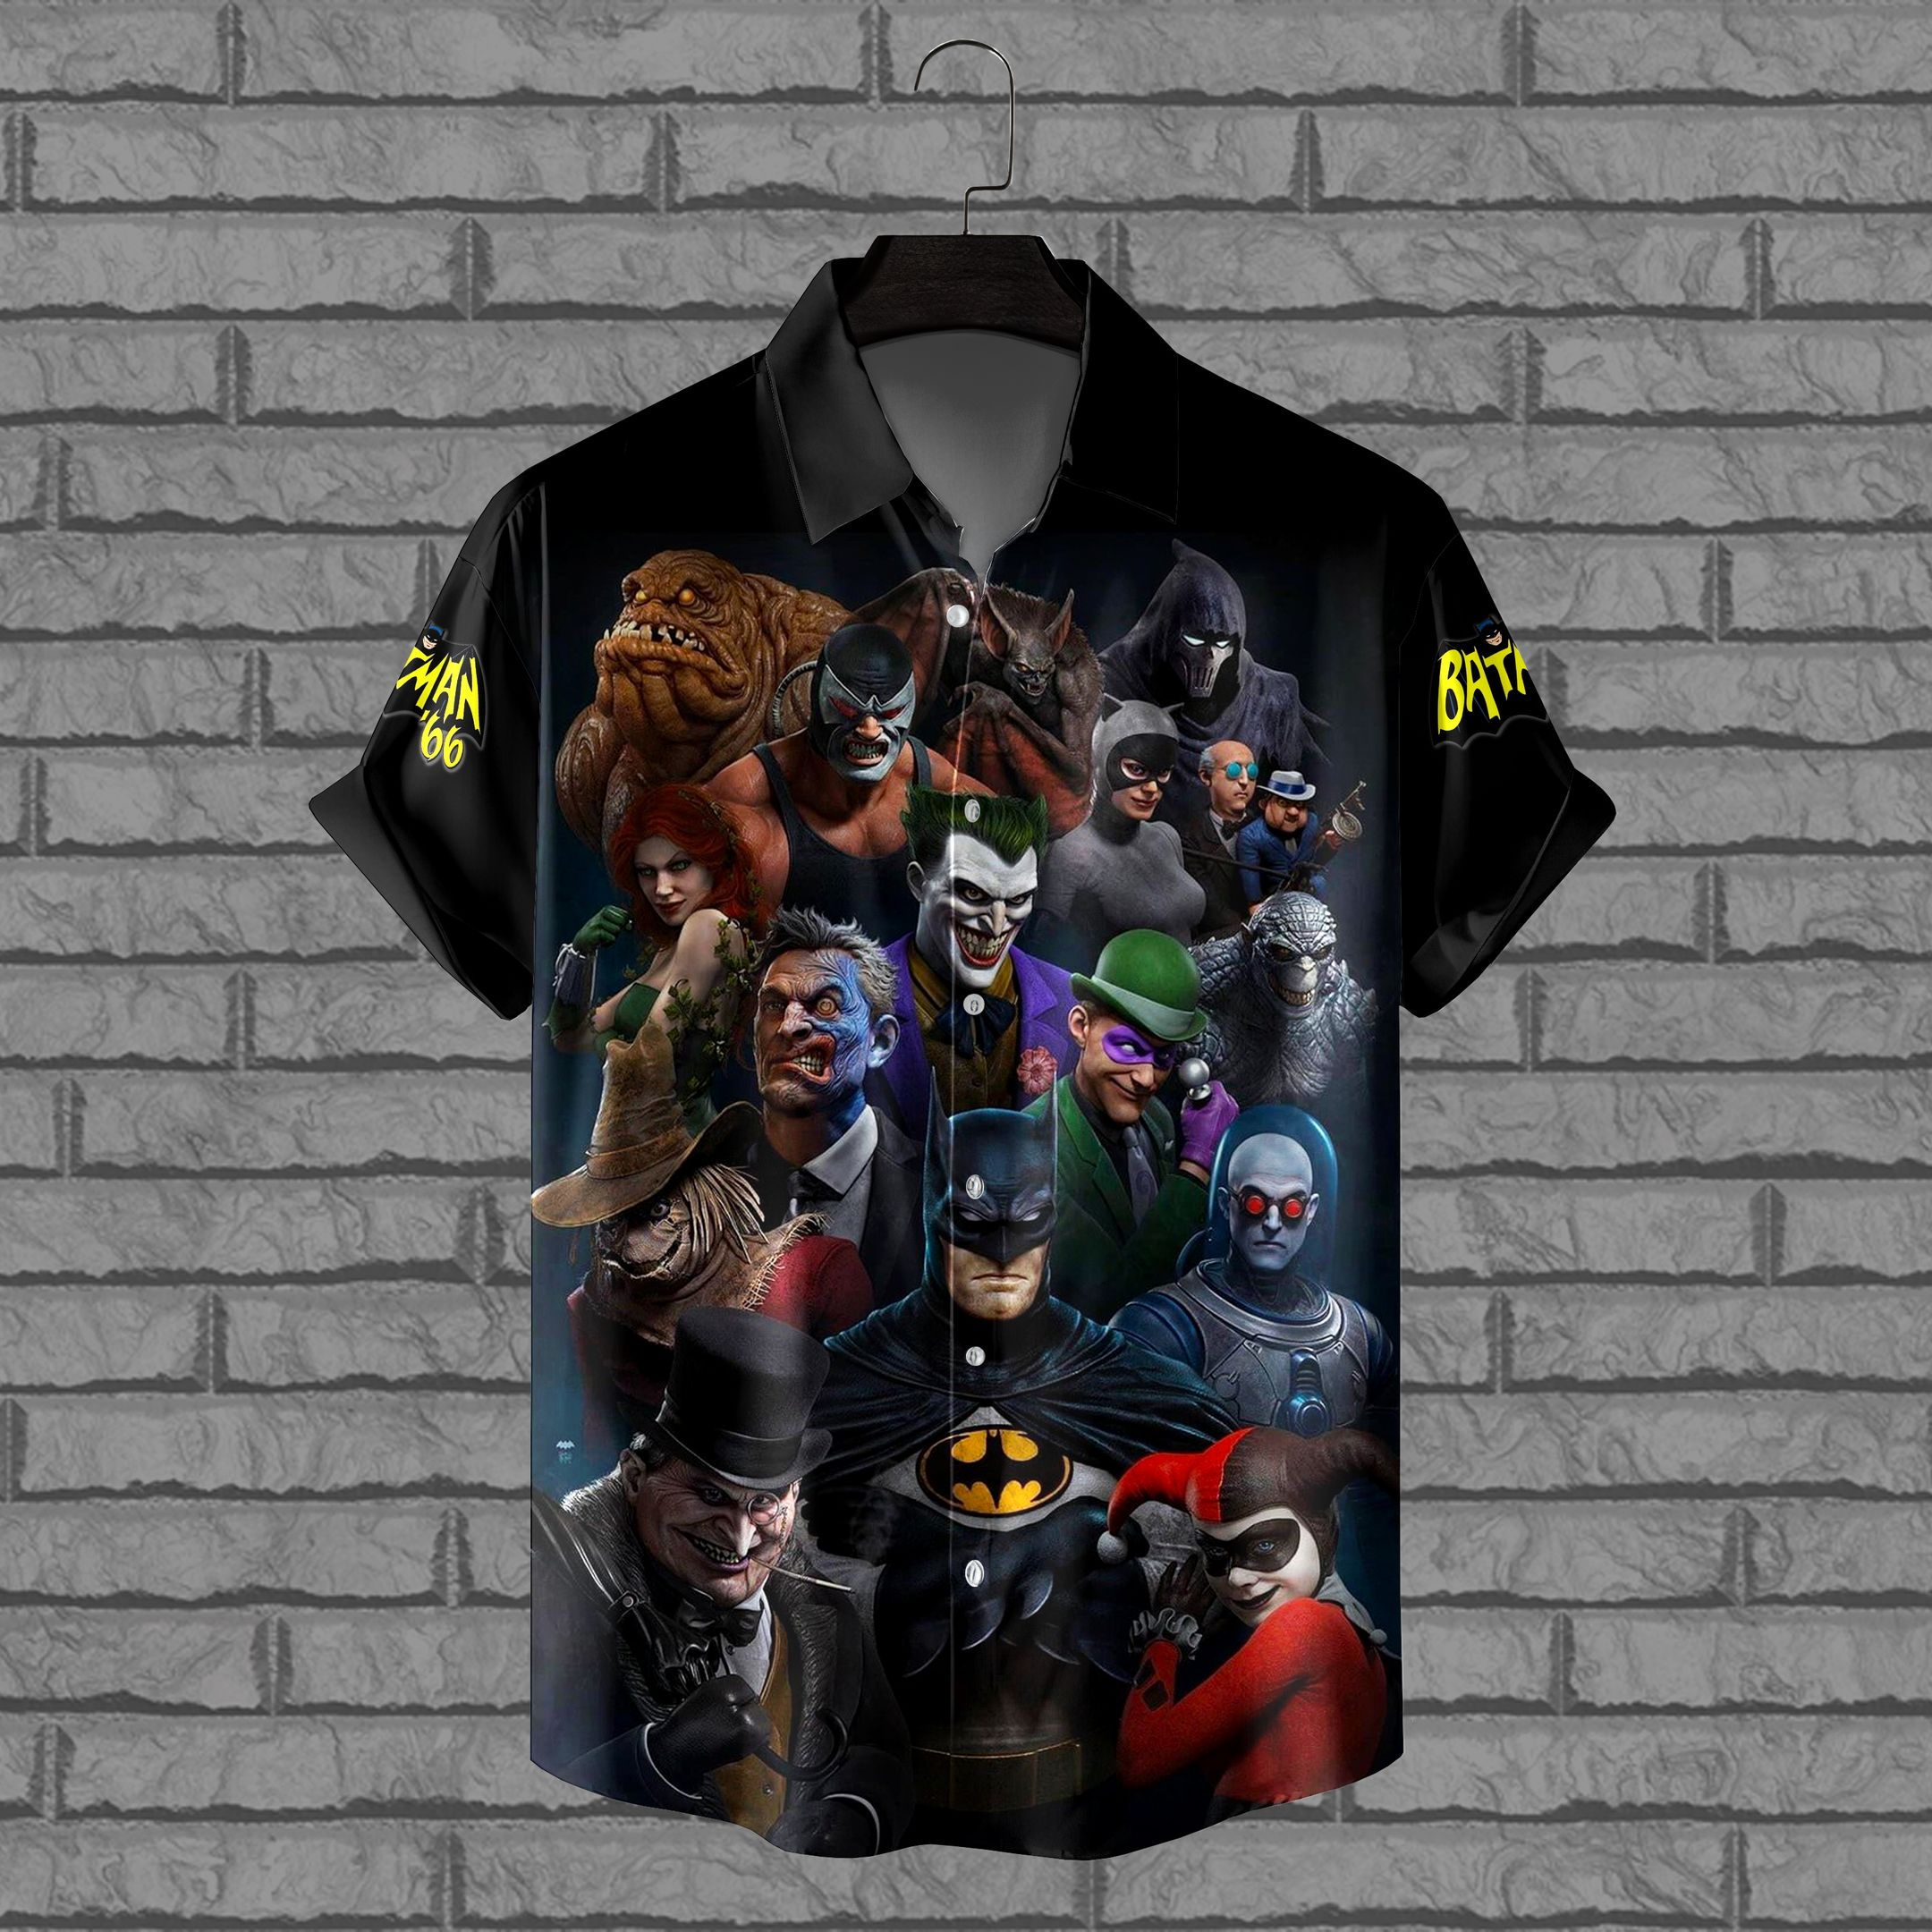 Batman Movie Animated Characters Hawaiian Shirt